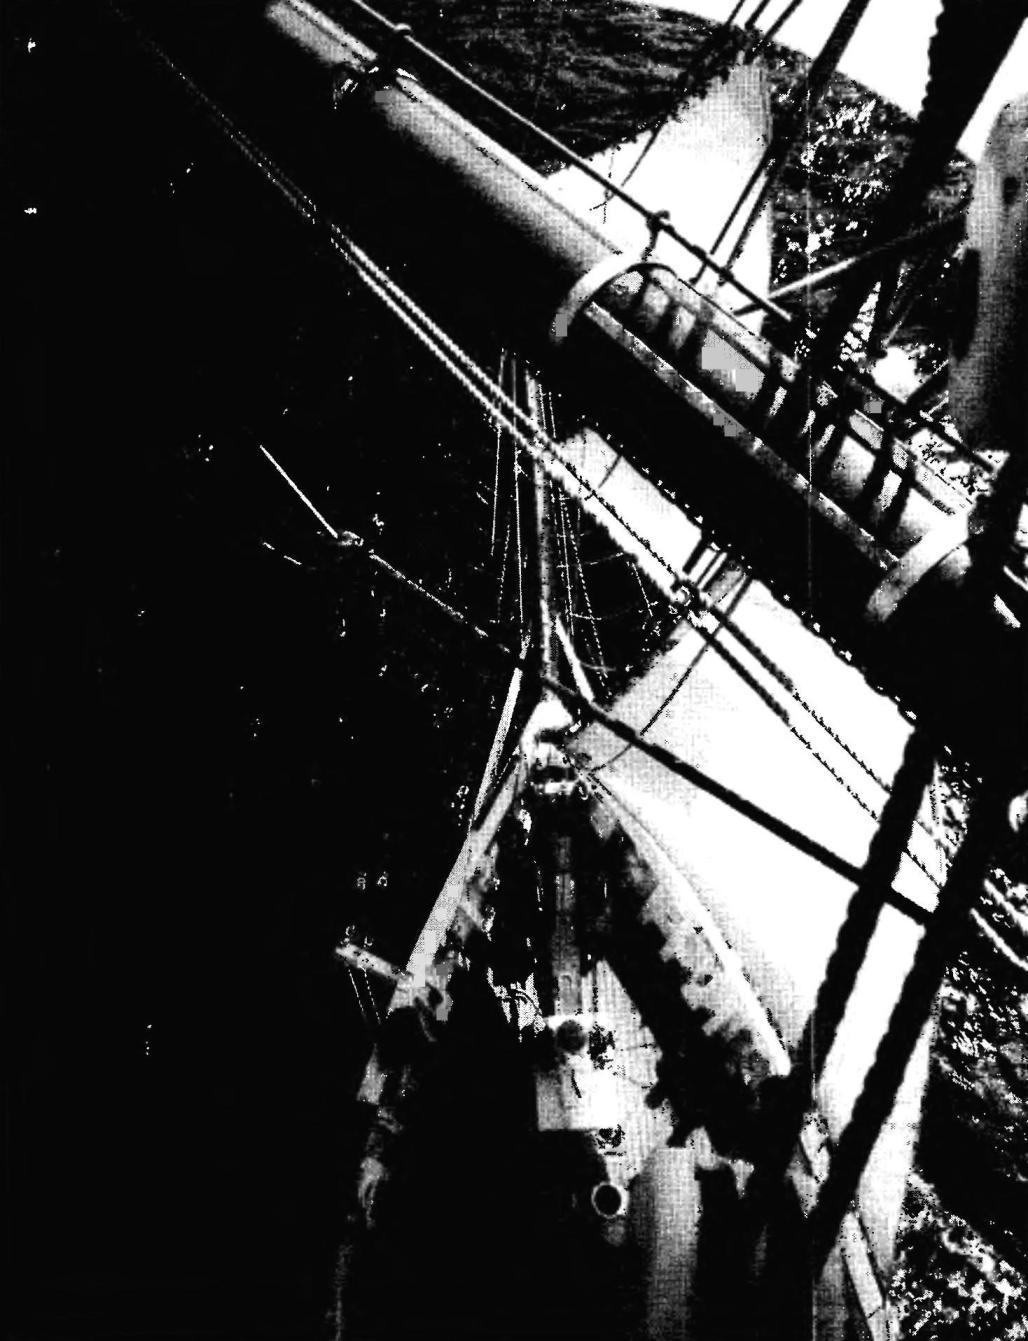 Шхуна «Этуаль». Вид на палубу и камбузную надстройку